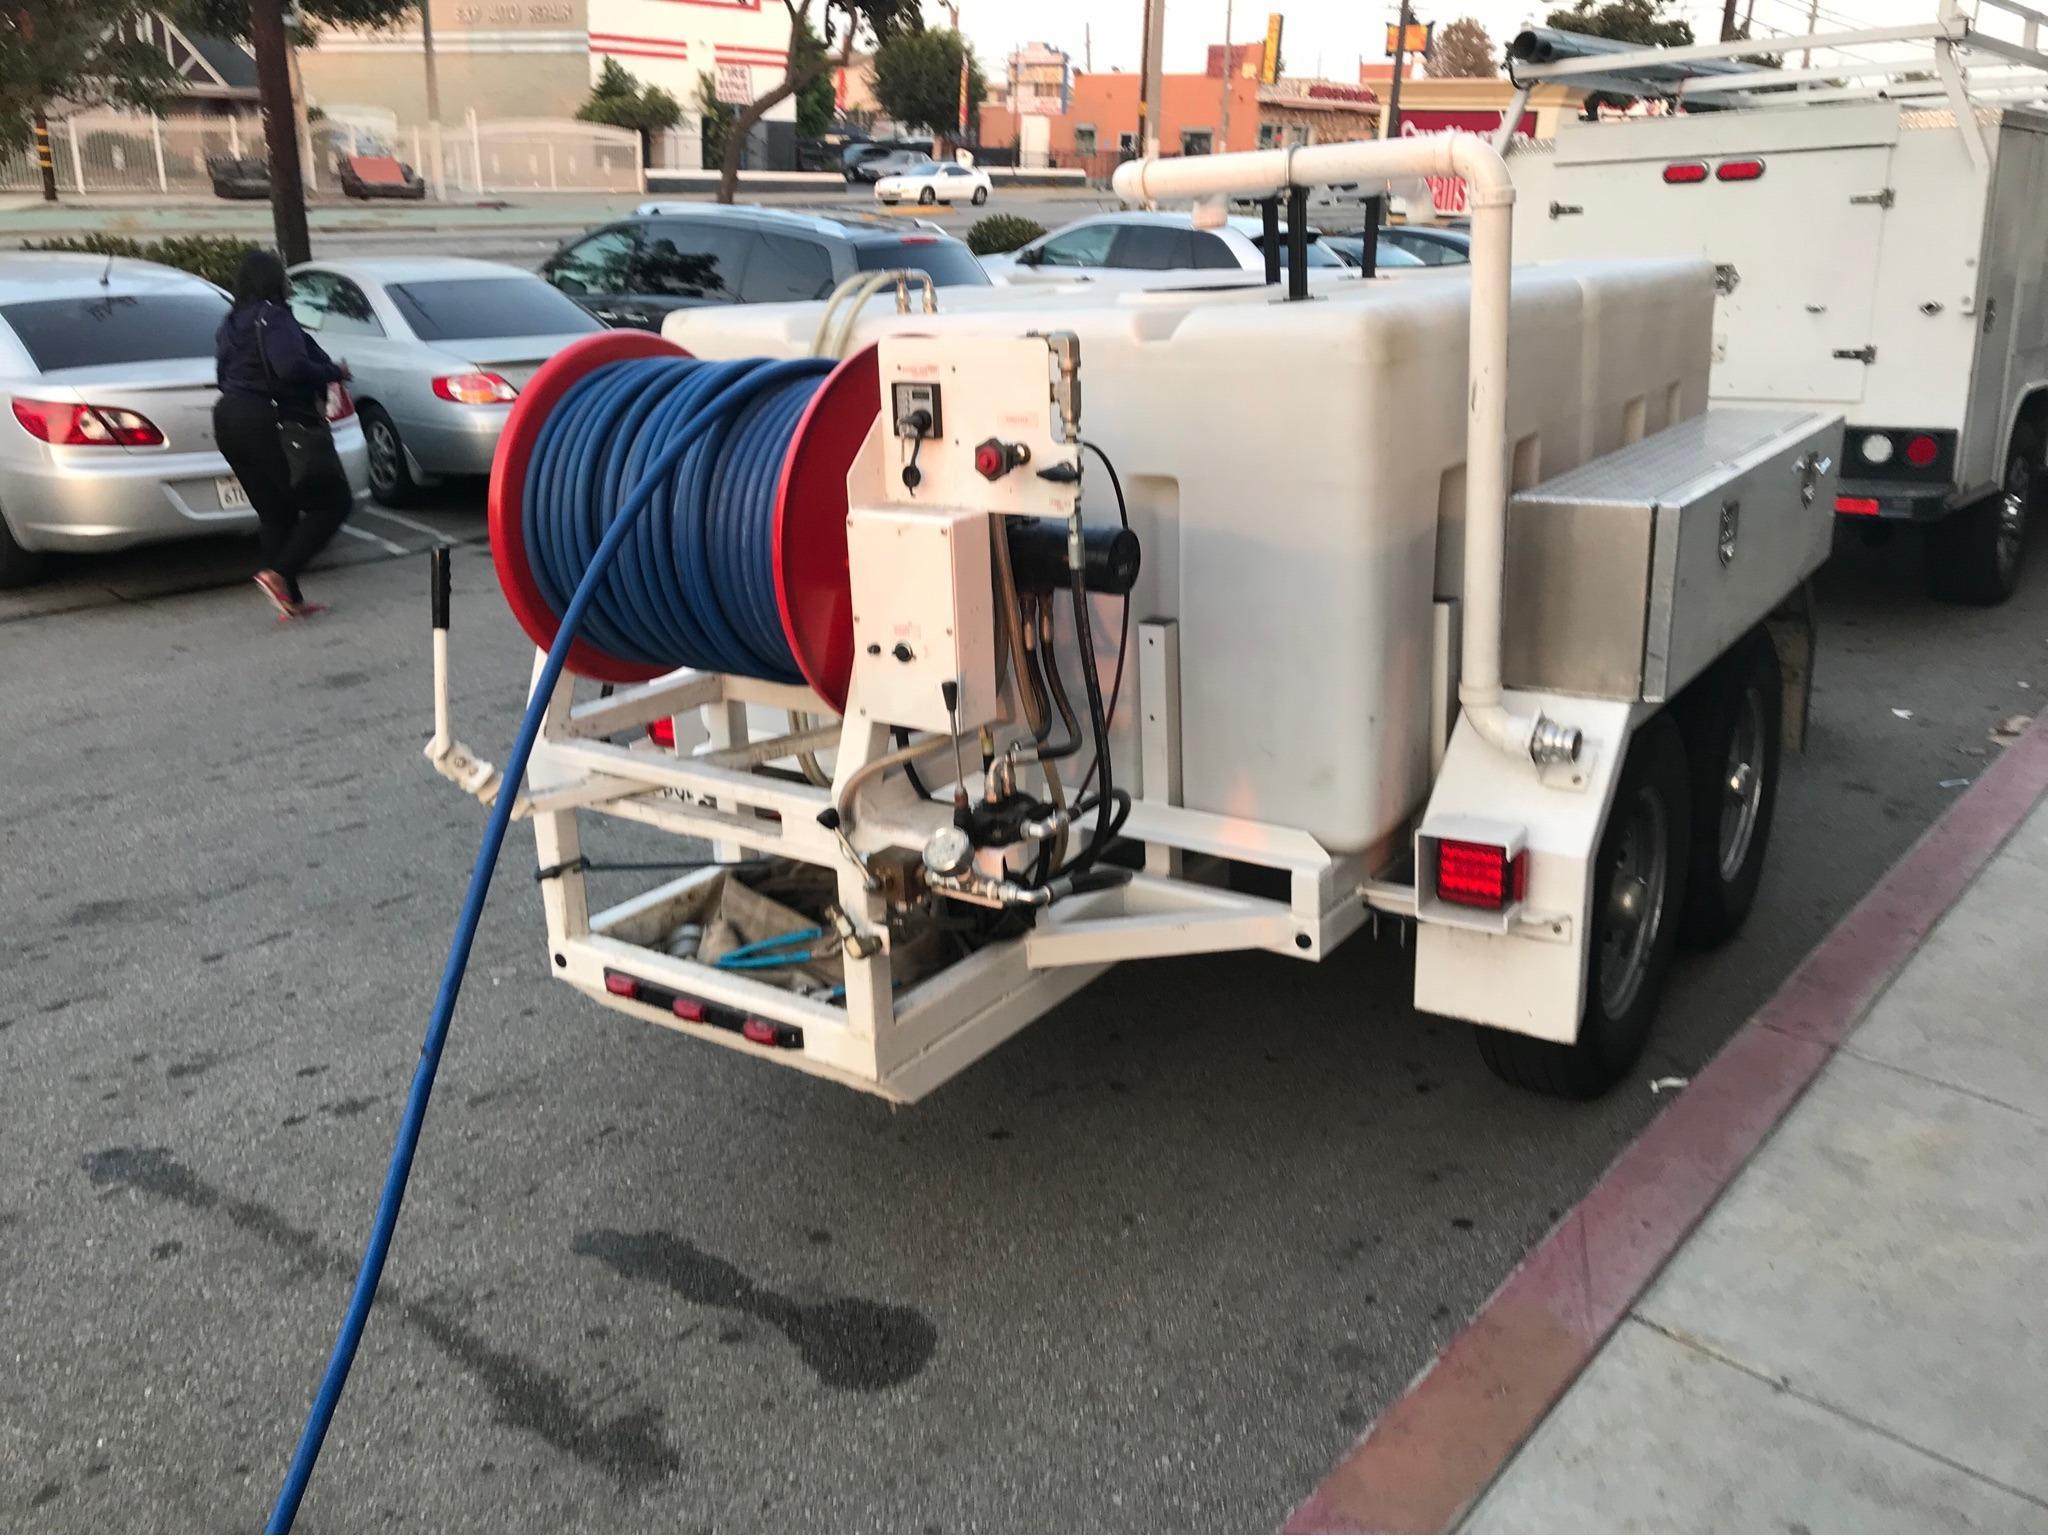 Leak Detection Mcdonalds Restoration - #1 Water Damage Restoration